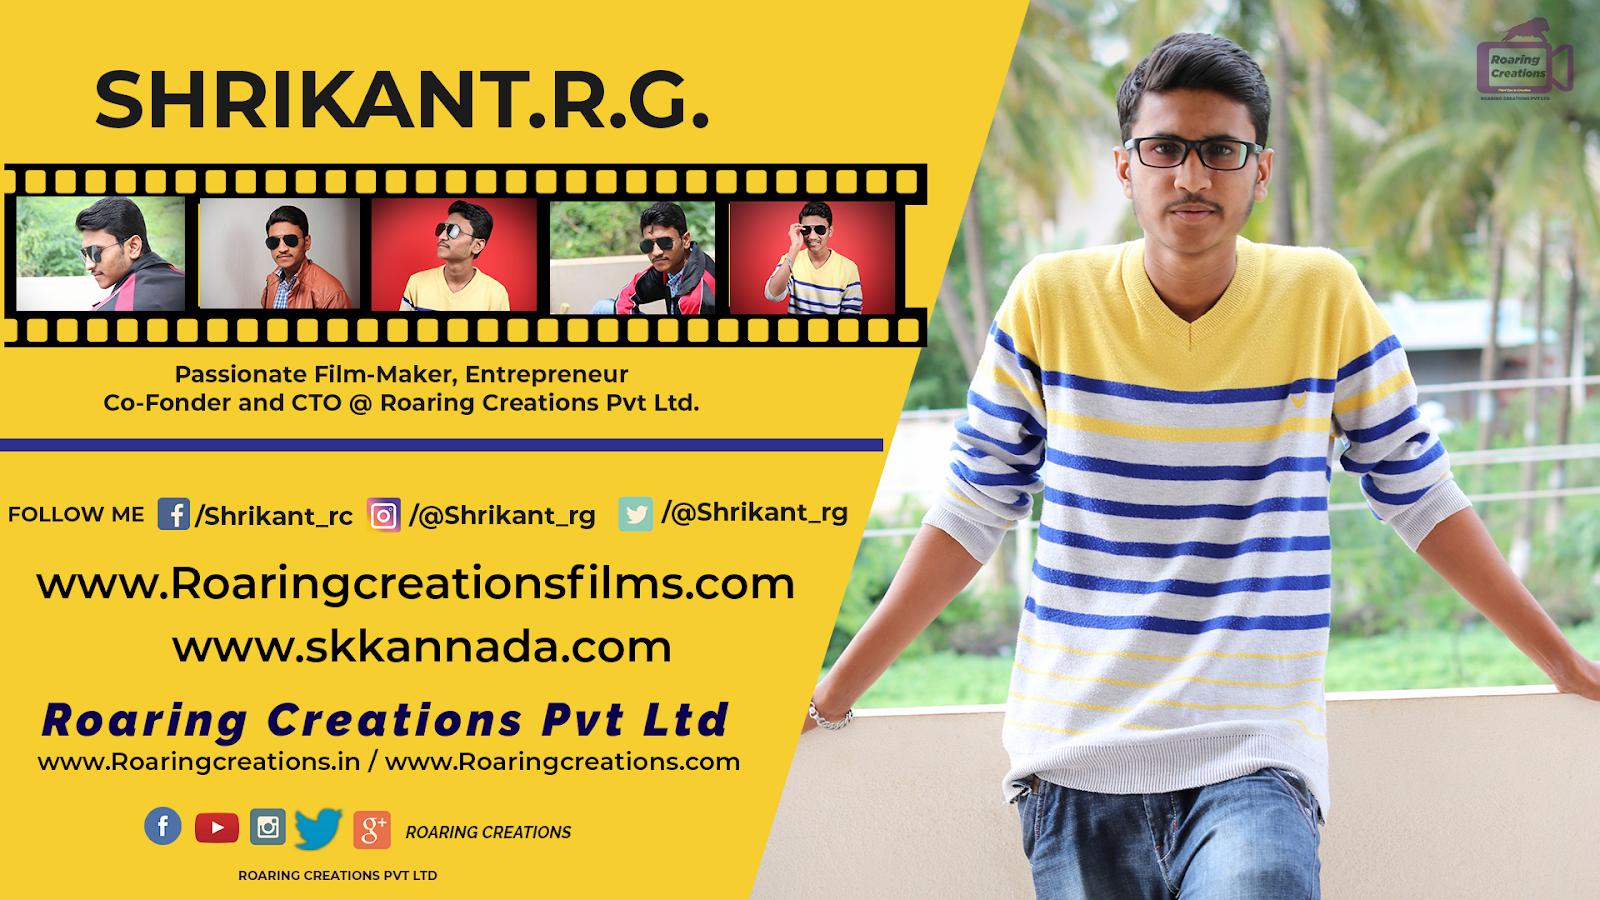 Shrikant R G, Producer Shrikant R G, Founder Roaring Creations